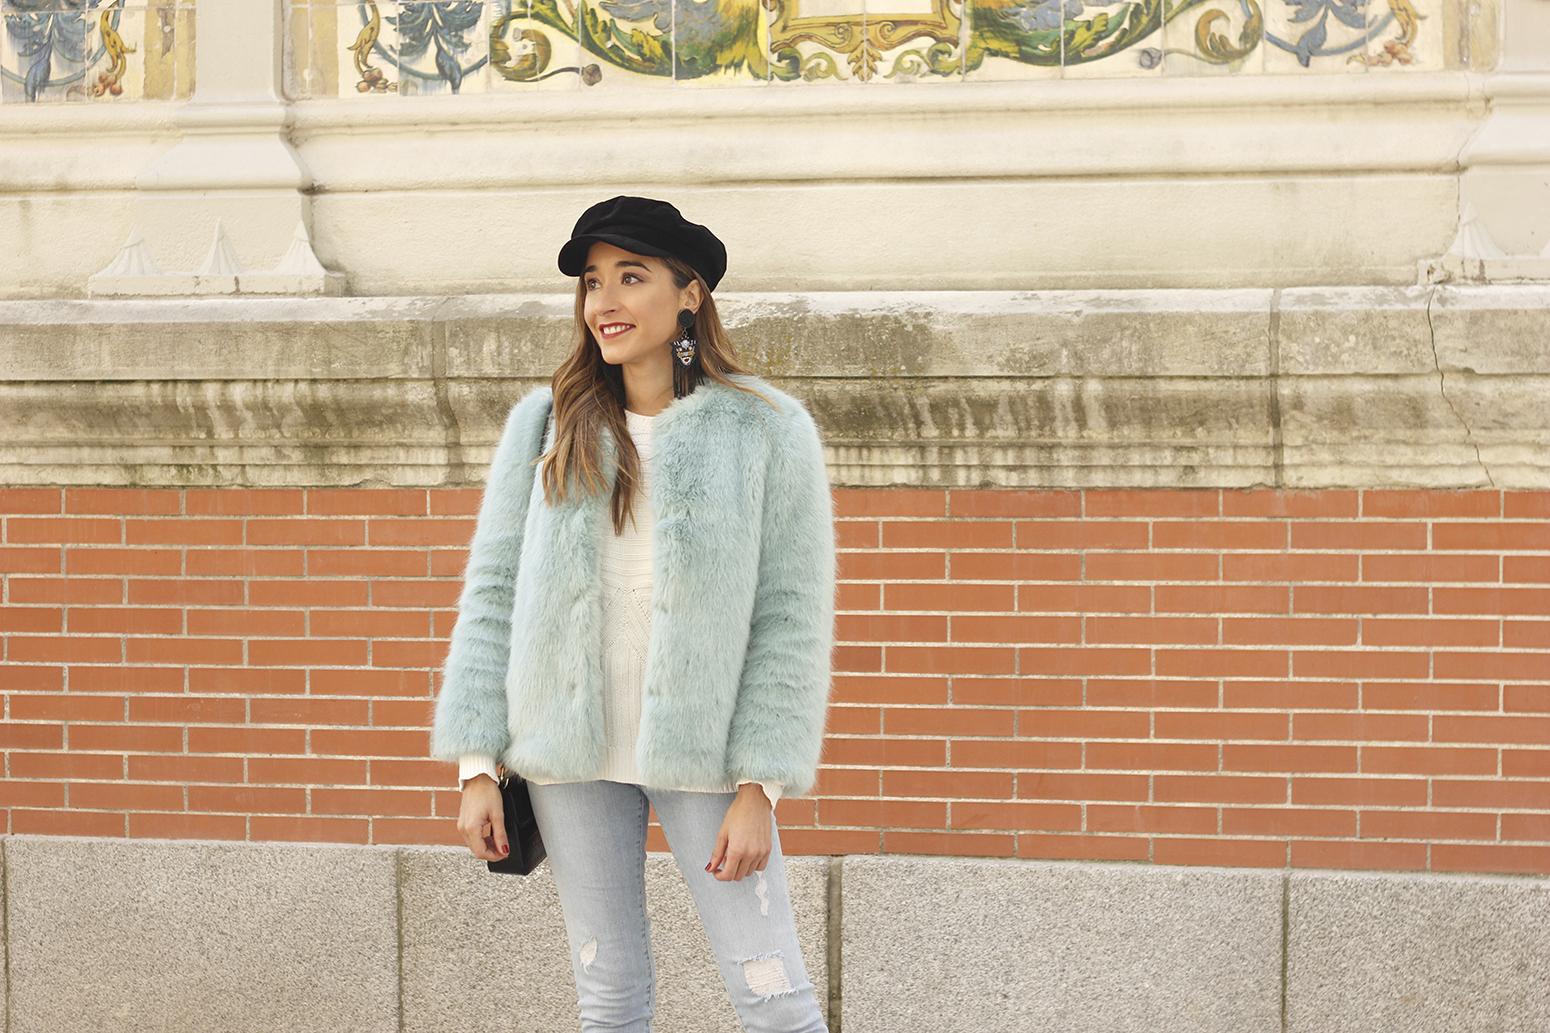 blue light faux fur coat navy cap ripped jeans zara tiger uterqüe earrings outfit street style07